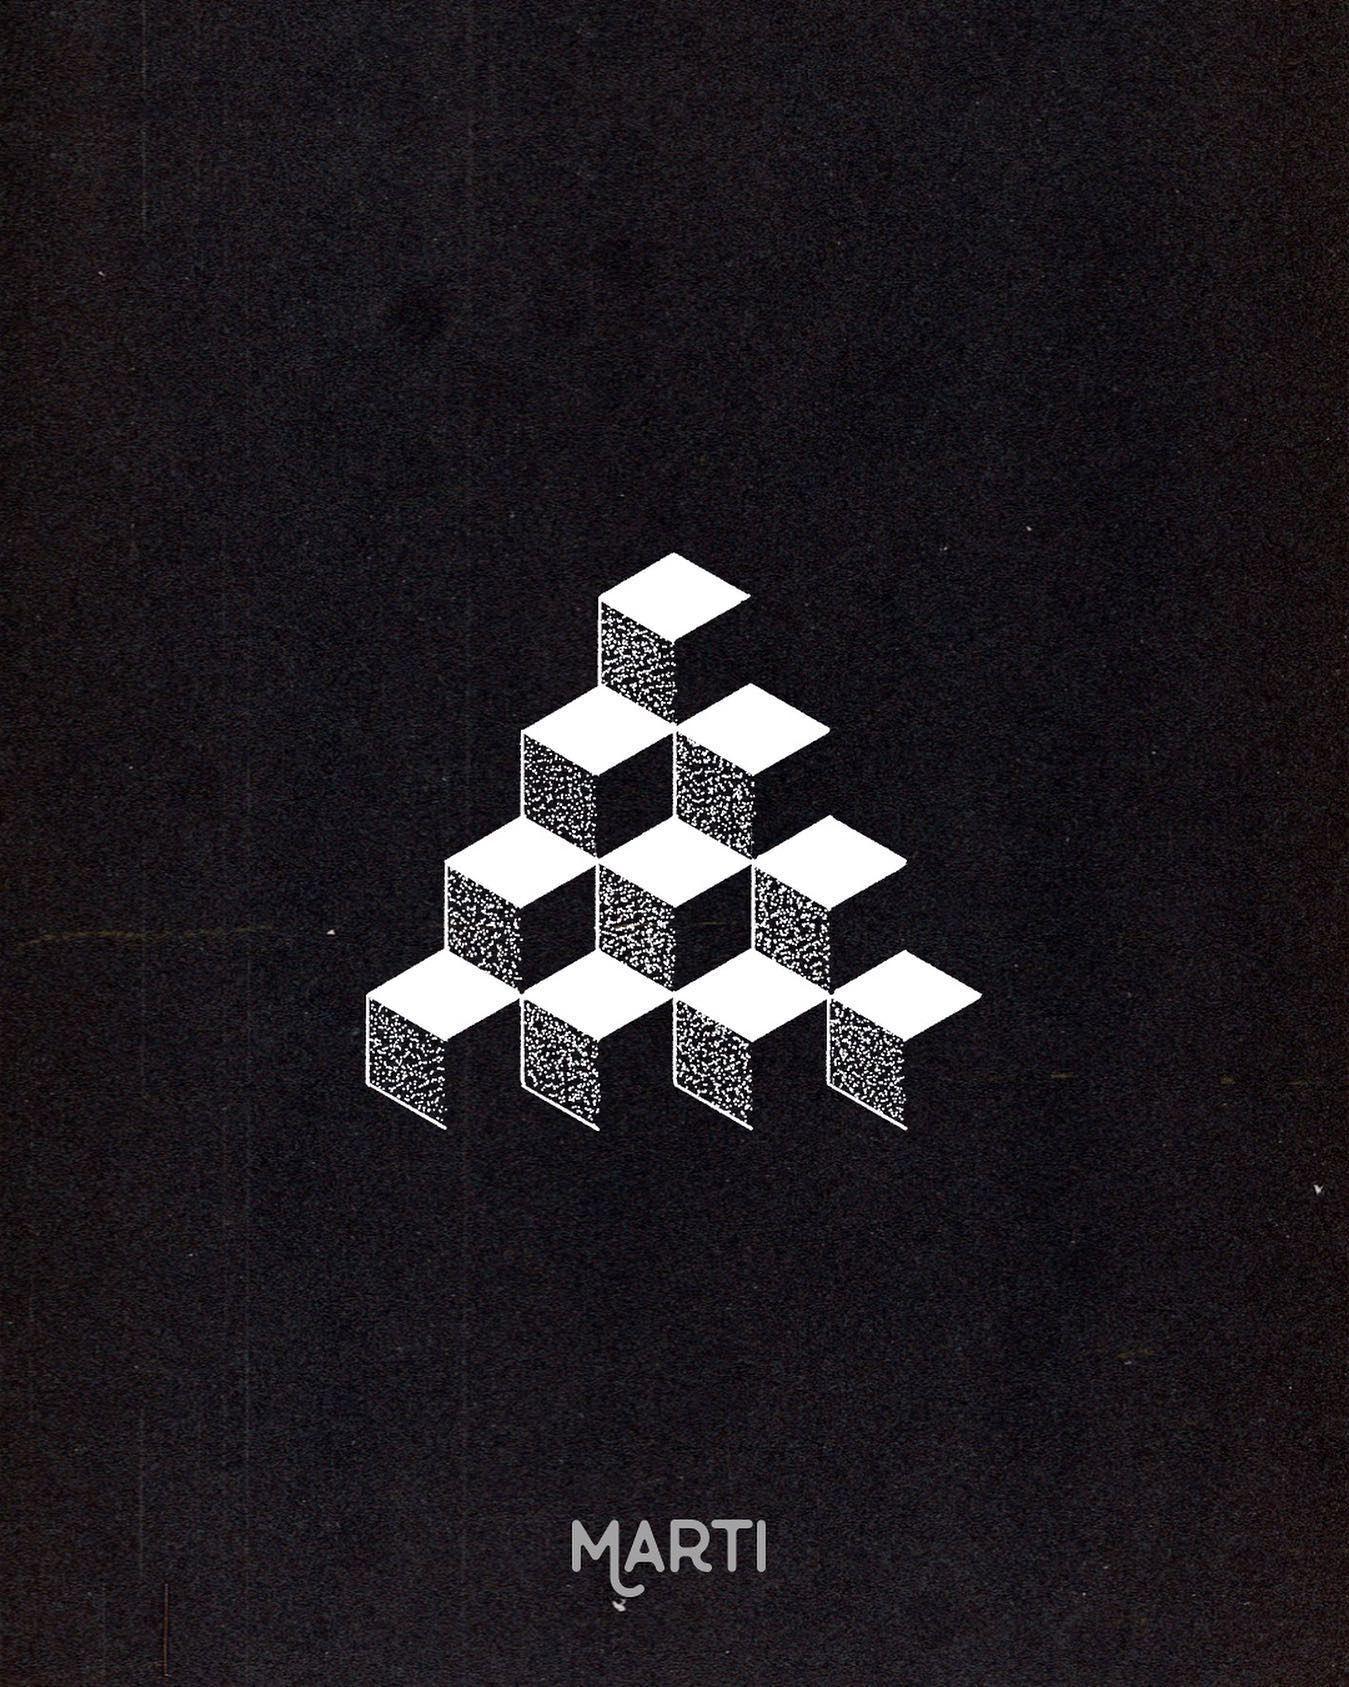 Geometrical Pyramid . . . . .  #blackandwhitedrawing#dotworkfeature#dots #blackinkwork #geometricdesign #dotwork#stippling #geometrical #geometricart #geometrictattoo #geometric #tattooideas #tattoodesign #linework #linedrawing #tattoodrawings #inkaholik#stippling #stipplingart #stipplingtattoo